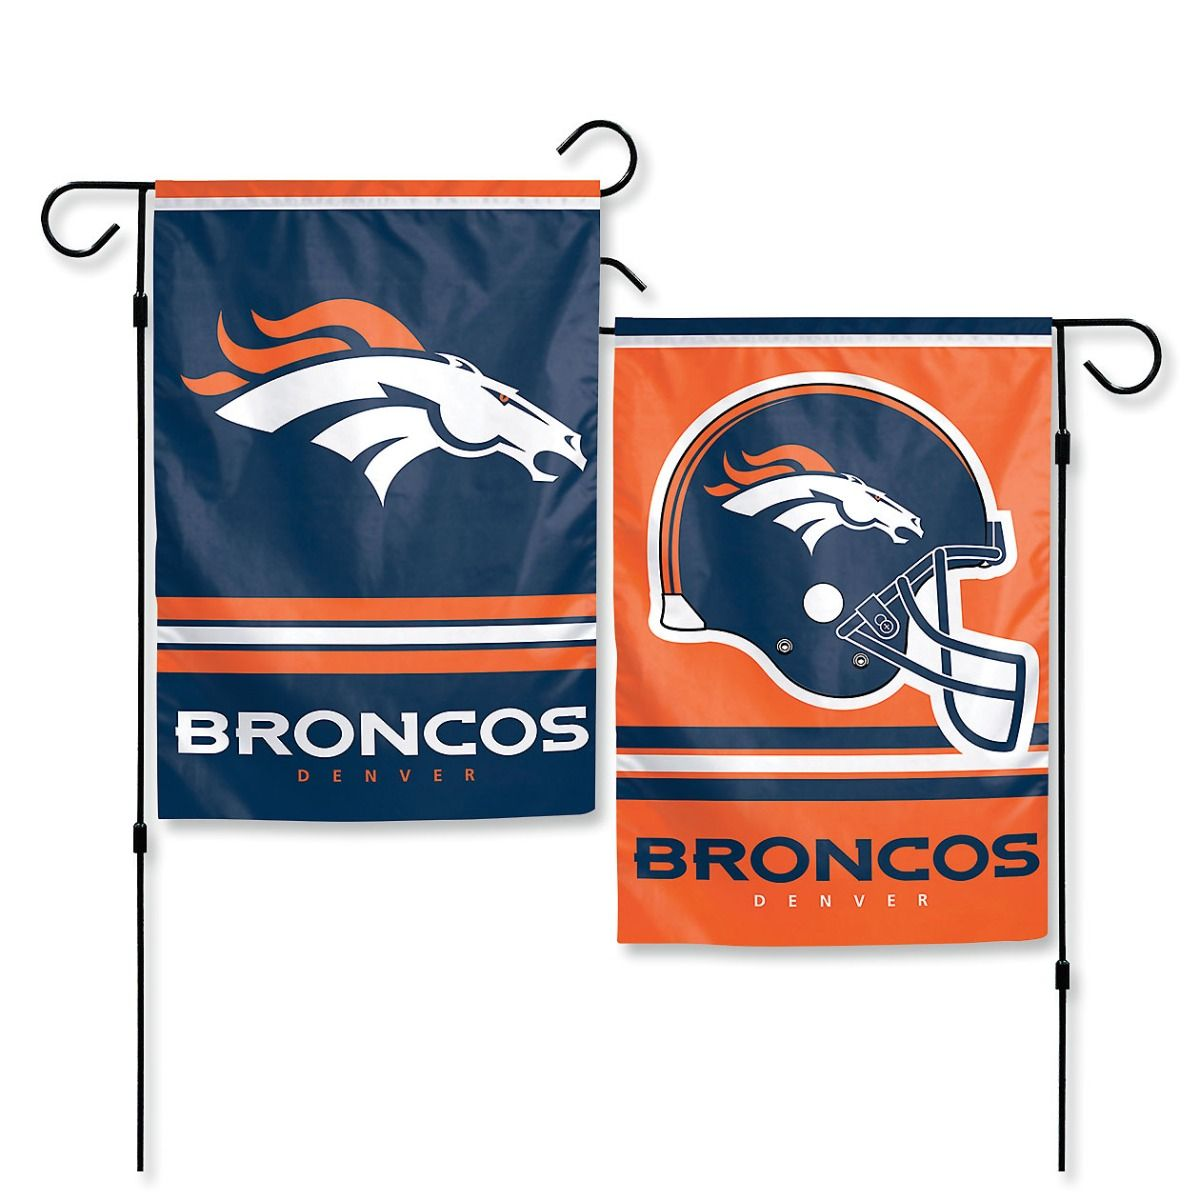 NFL Garden Flags - (11 Teams Available)